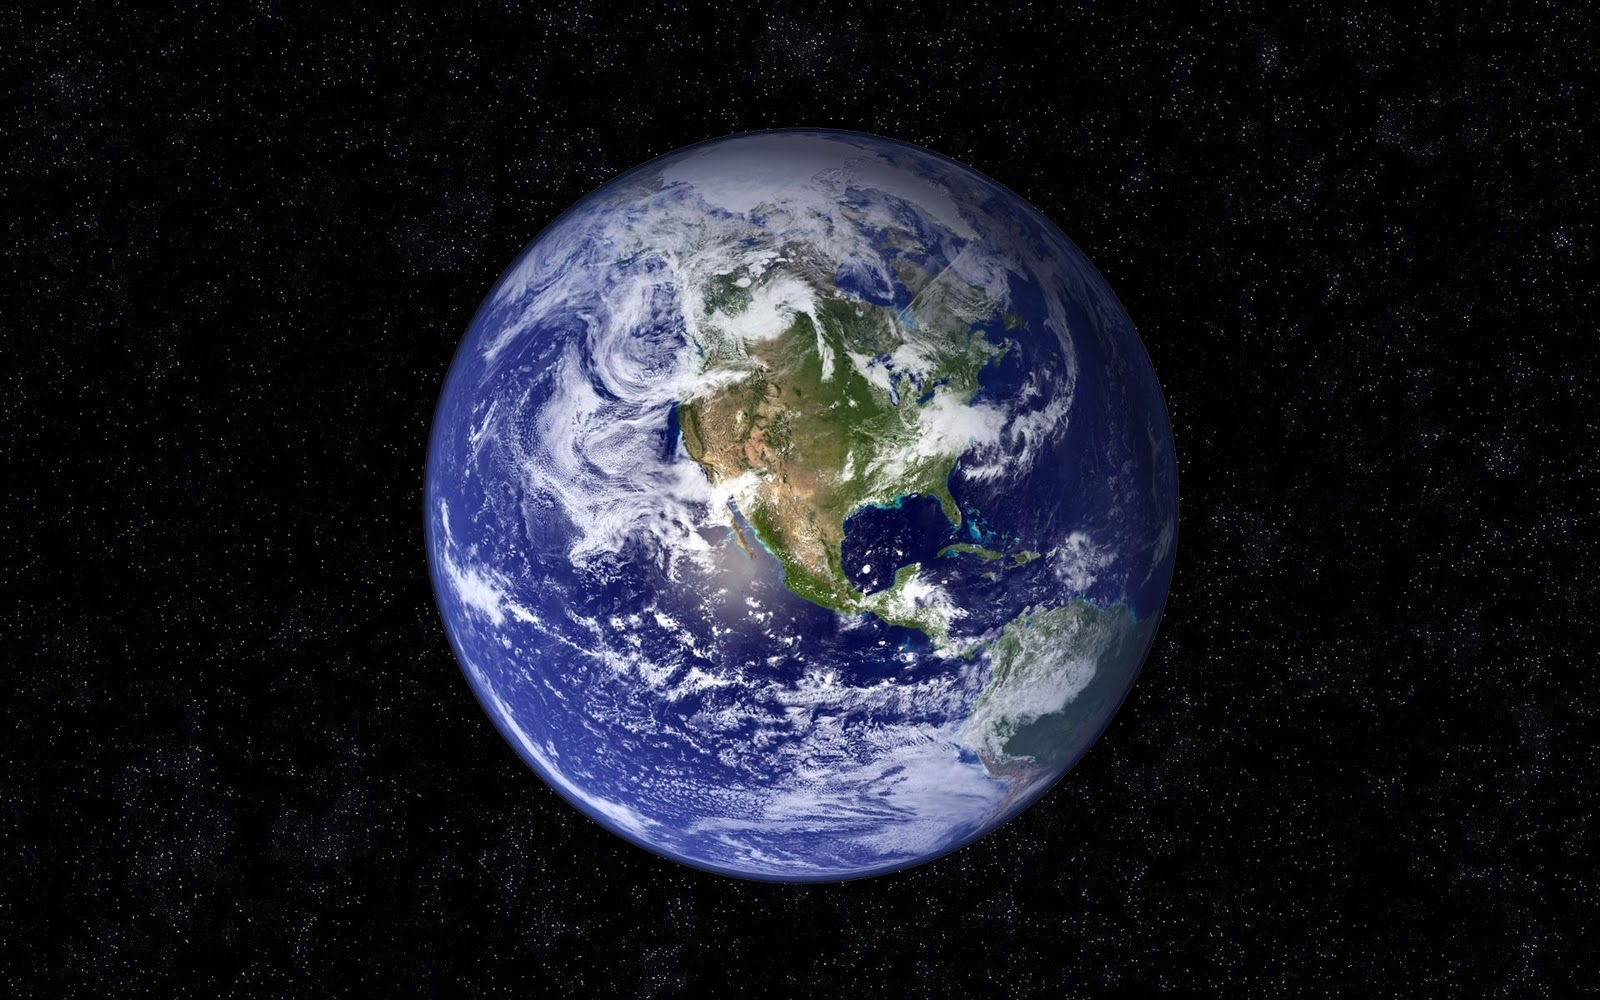 http://1.bp.blogspot.com/-4EjDzGEOc4k/UBK_Su7fxNI/AAAAAAAAFzM/NUrwsMYvhWo/s1600/Earth-HD-Wallpaper.jpg